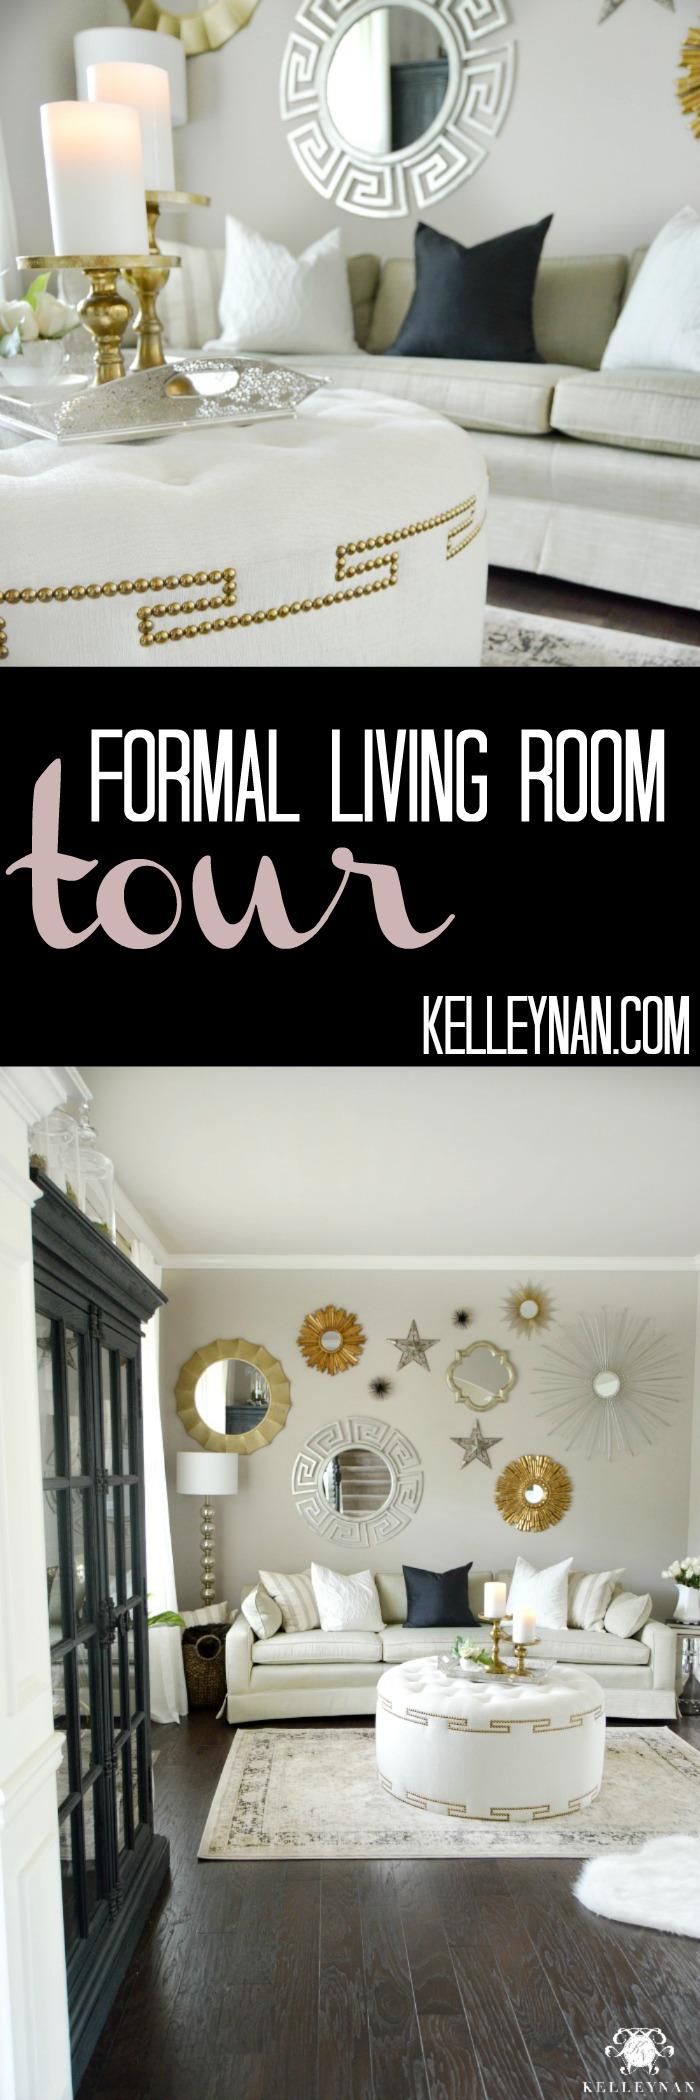 Formal Living Room Tour Pin